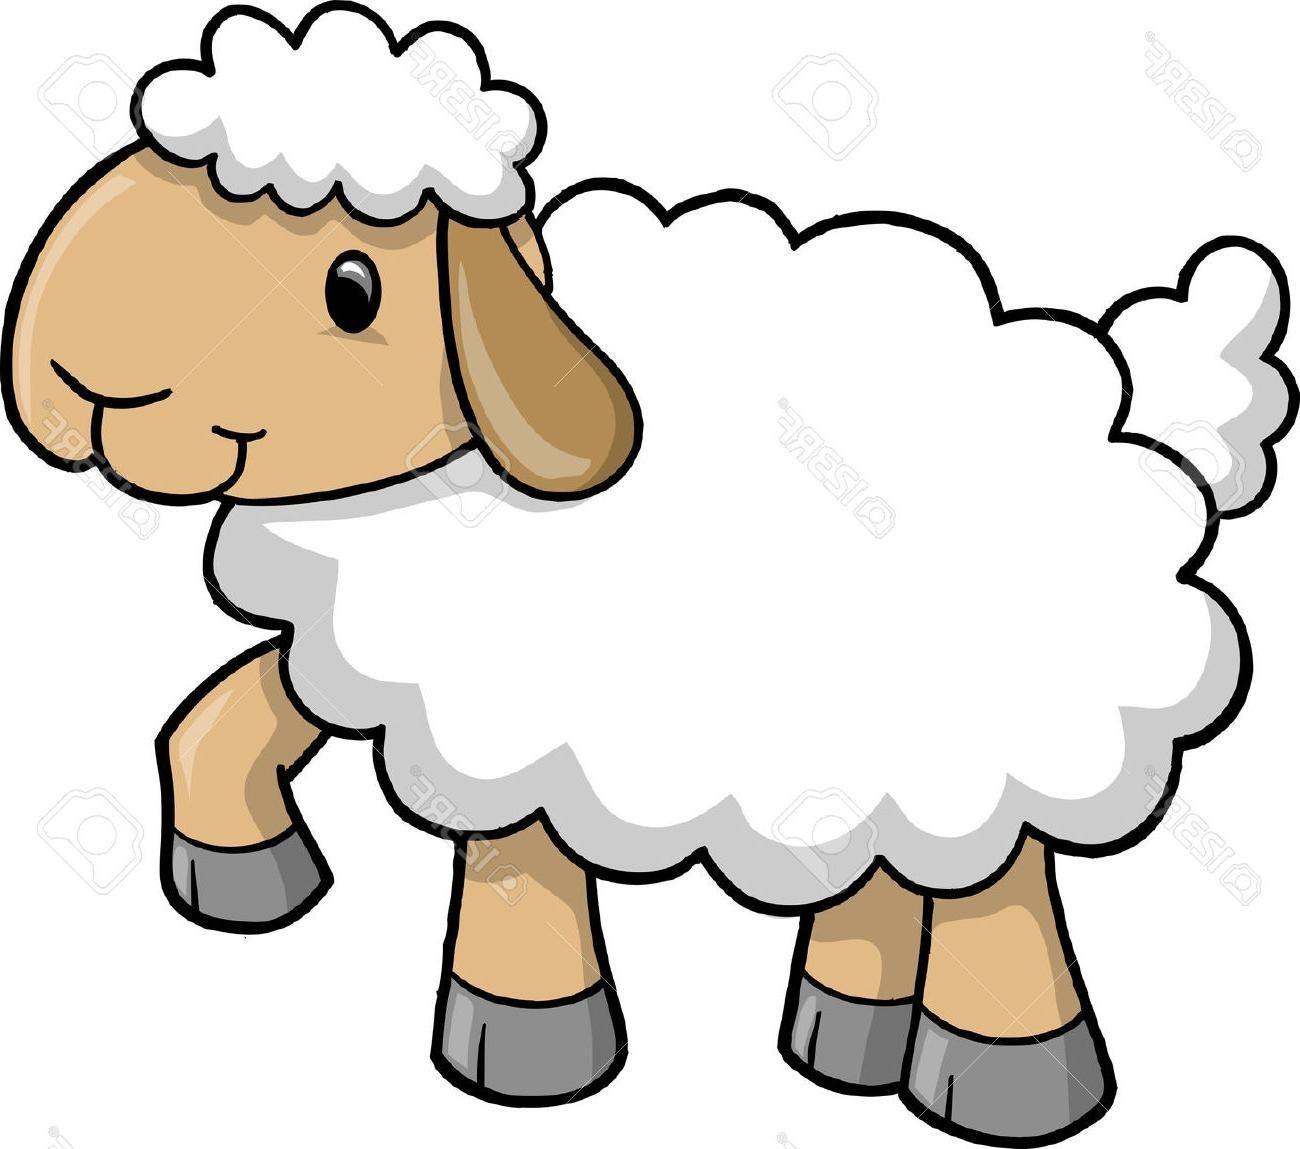 Lamb clipart. Animehana com